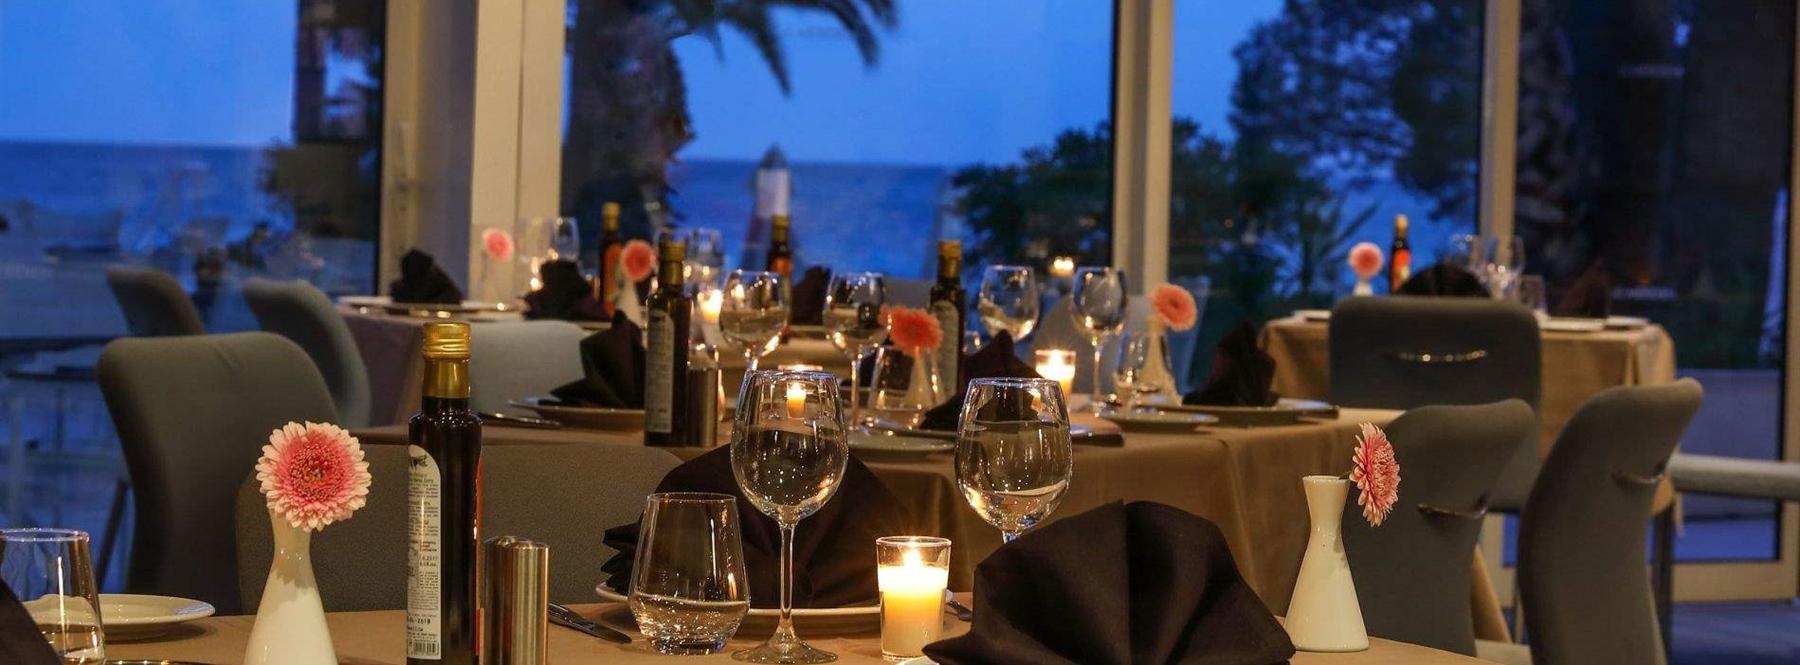 L'intempo Restaurant image 1